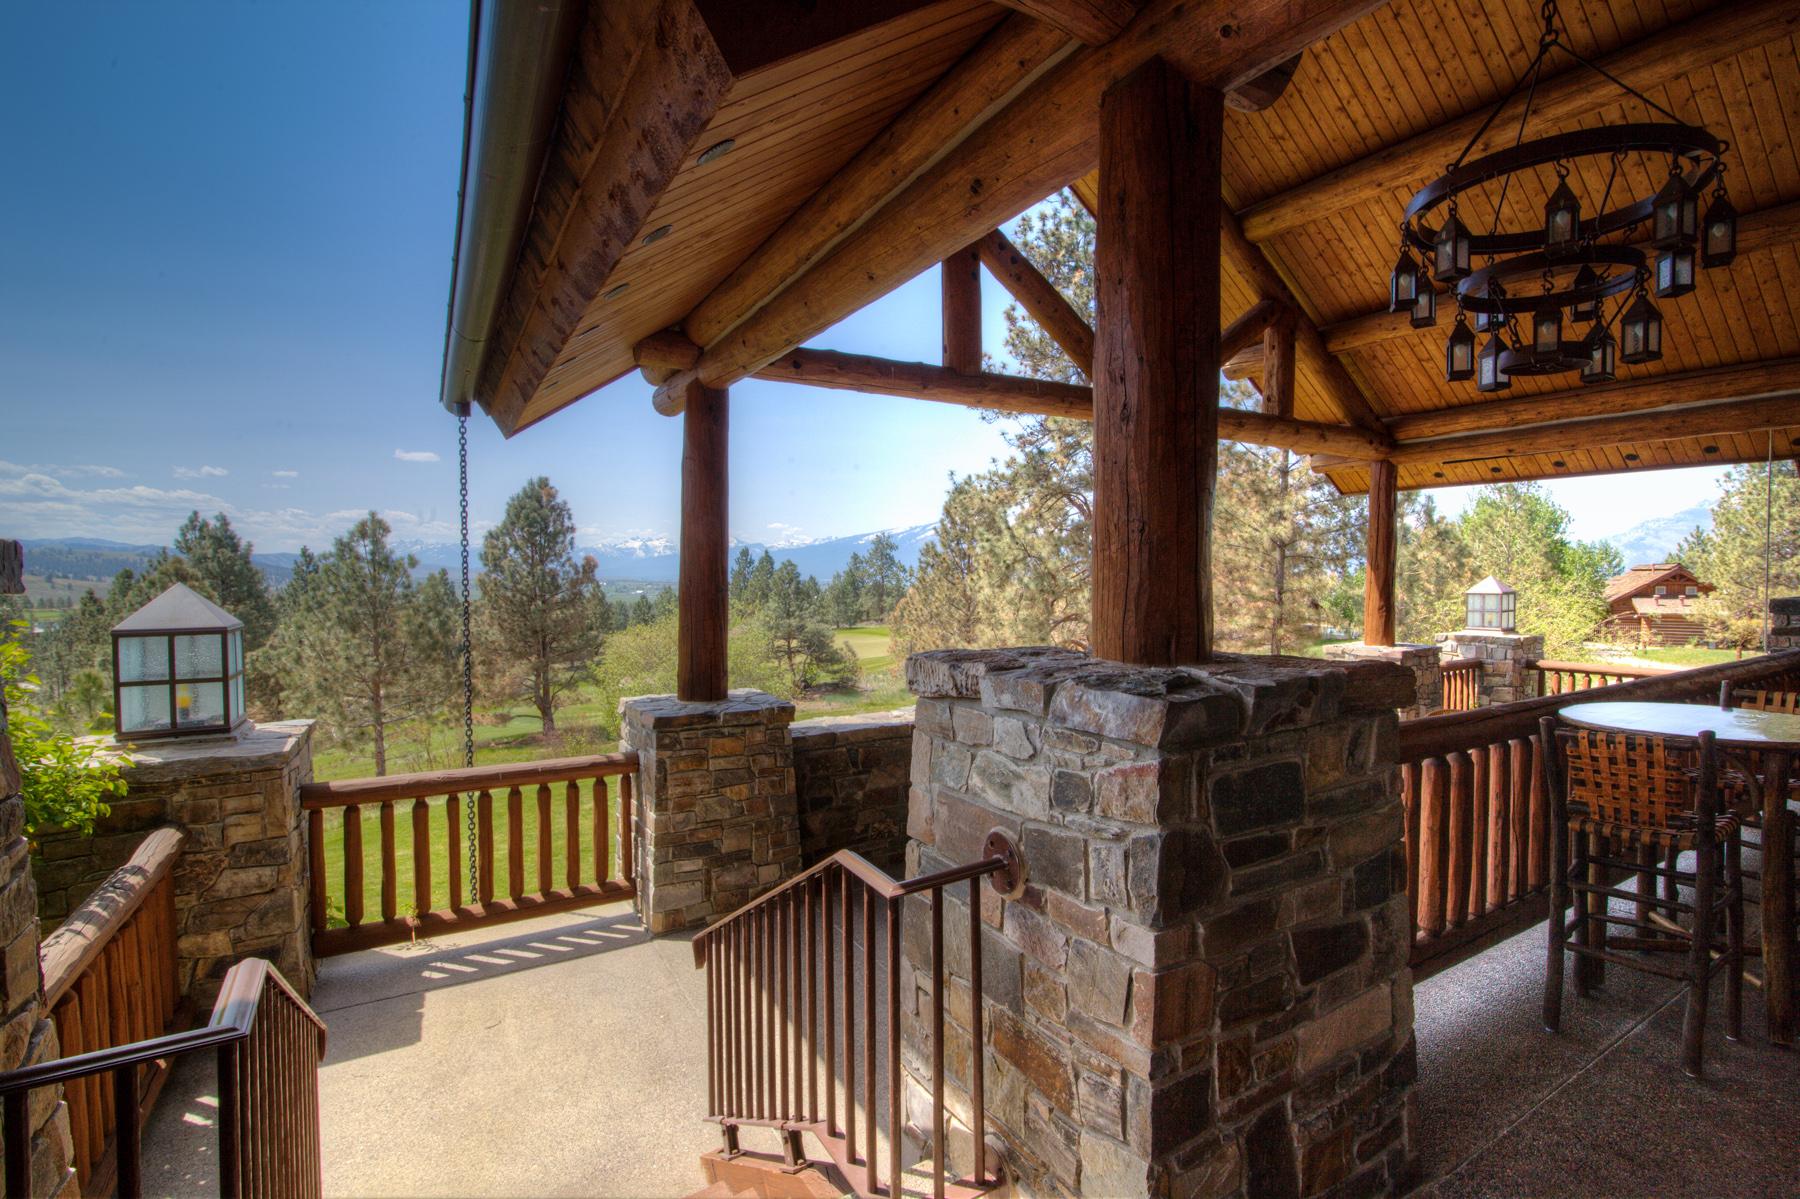 Additional photo for property listing at Lot 66 Stock Farm Lot 66  Stock Farm Rd Hamilton, Montana 59840 United States